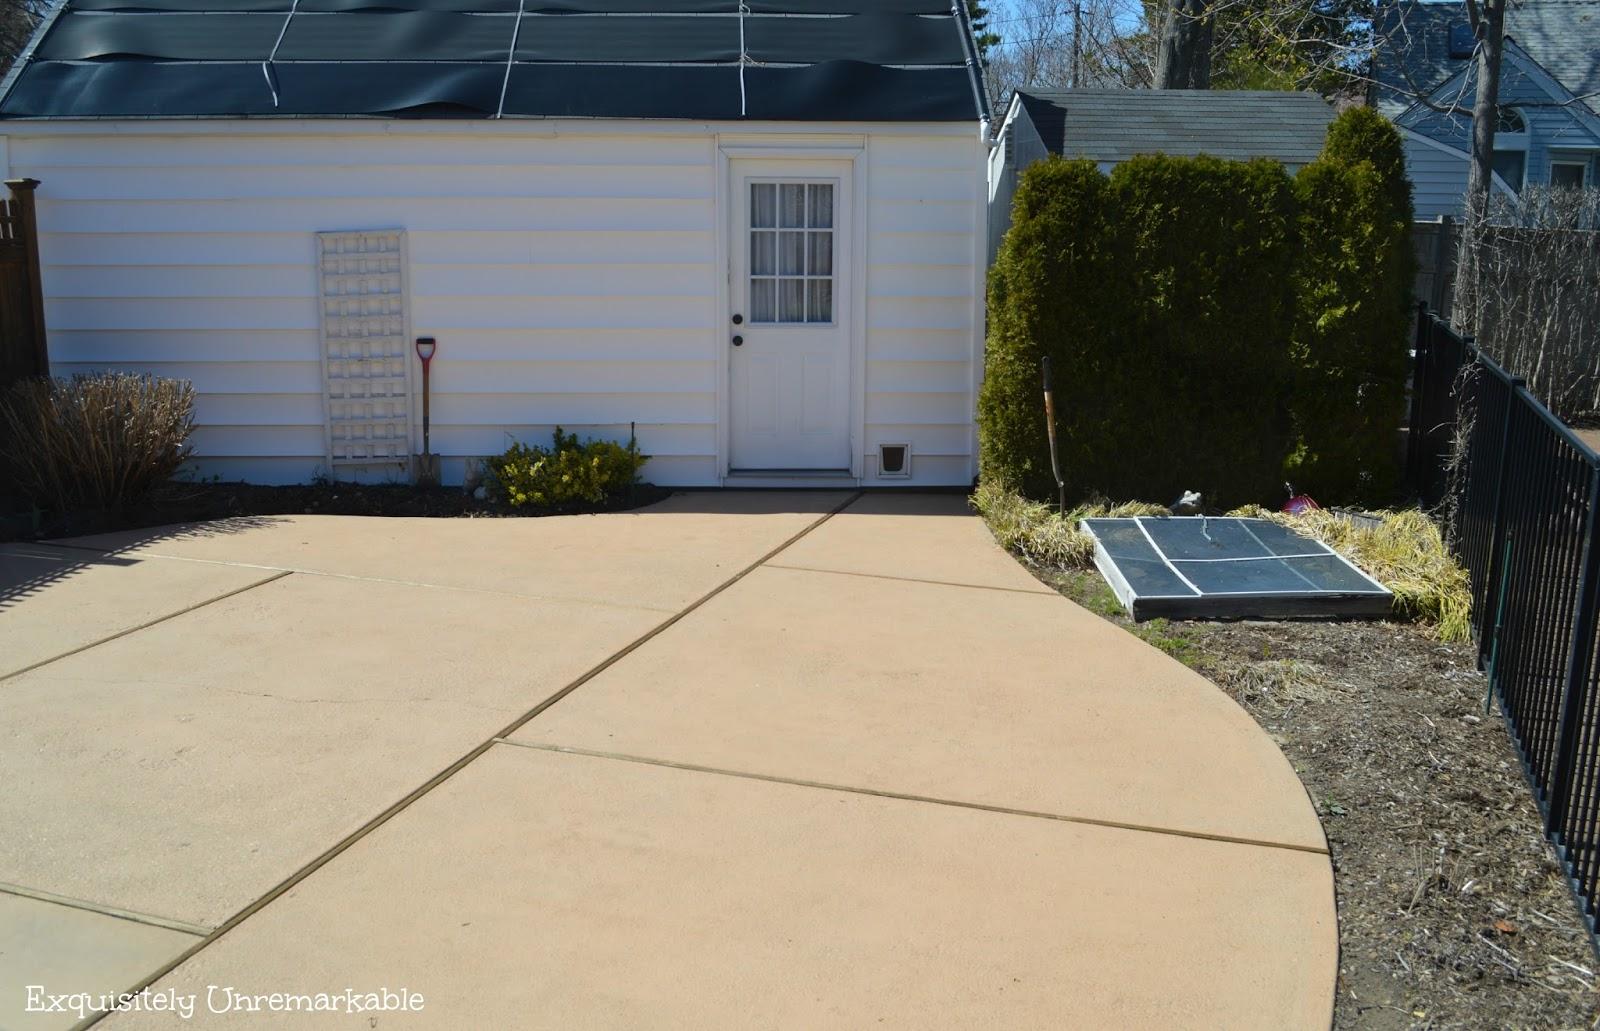 Staining a Concrete Patio Exquisitely Unremarkable